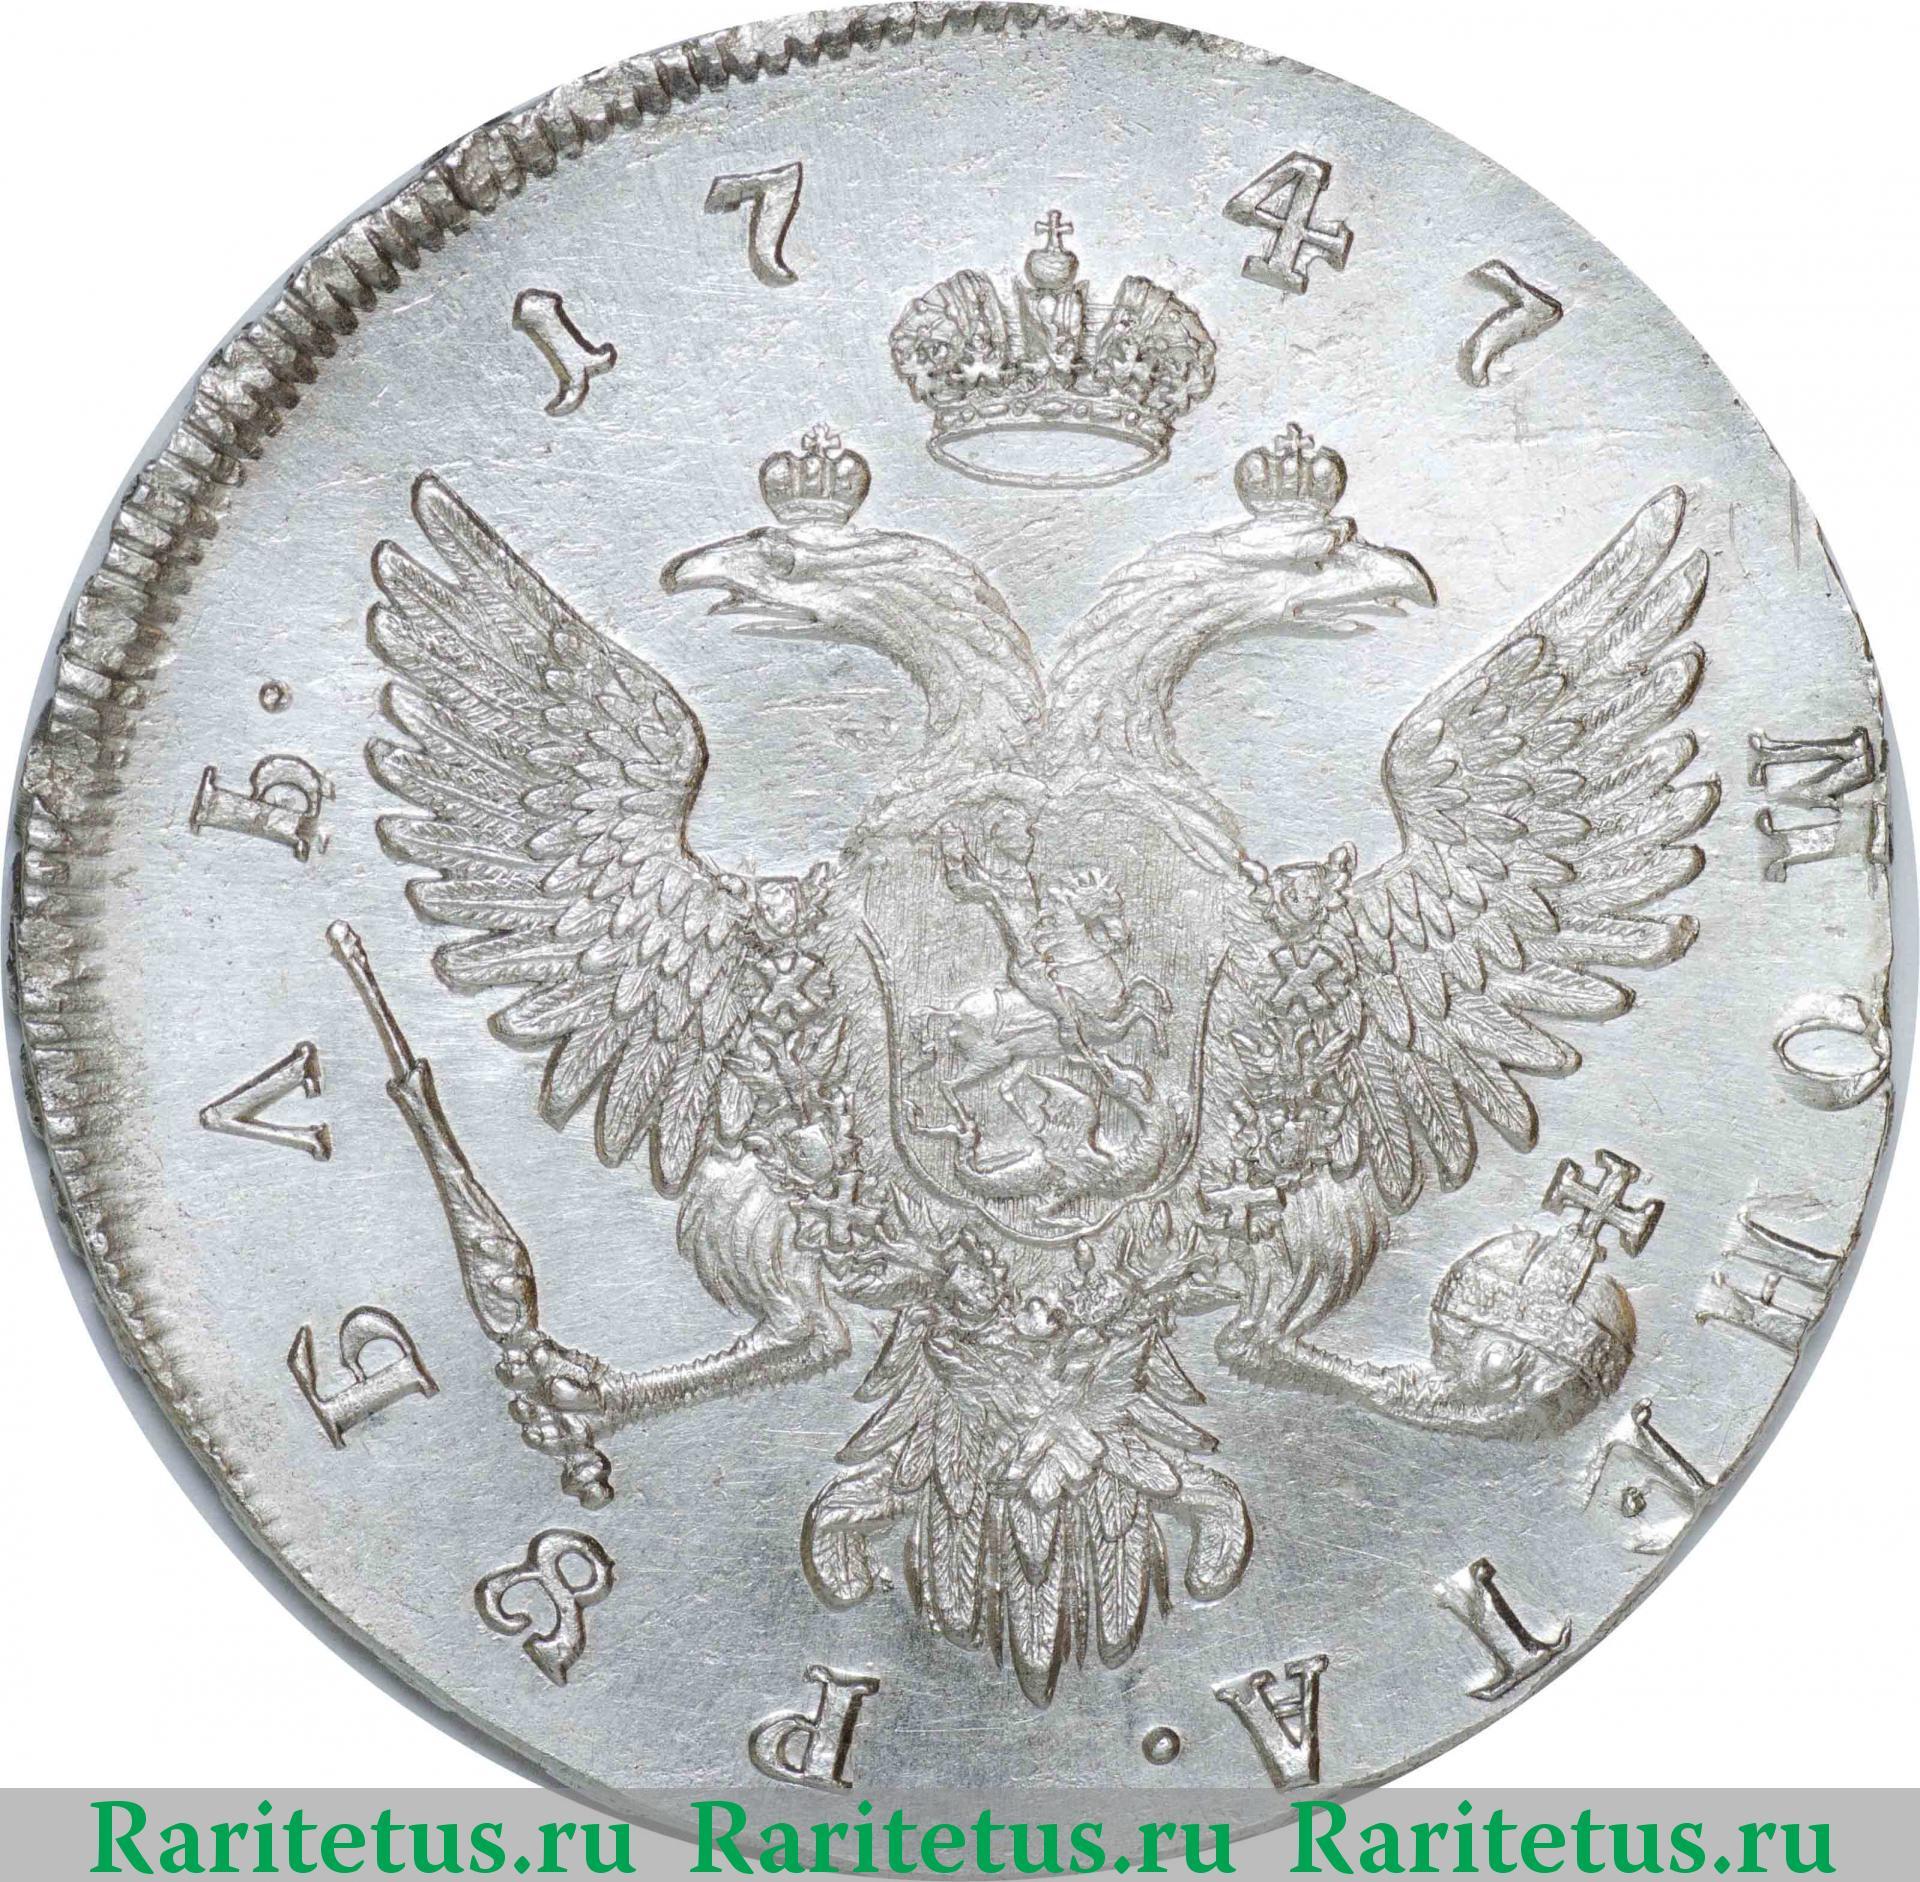 Монета рубль 1747 года елизаветы 1 рубль 1850 года цена